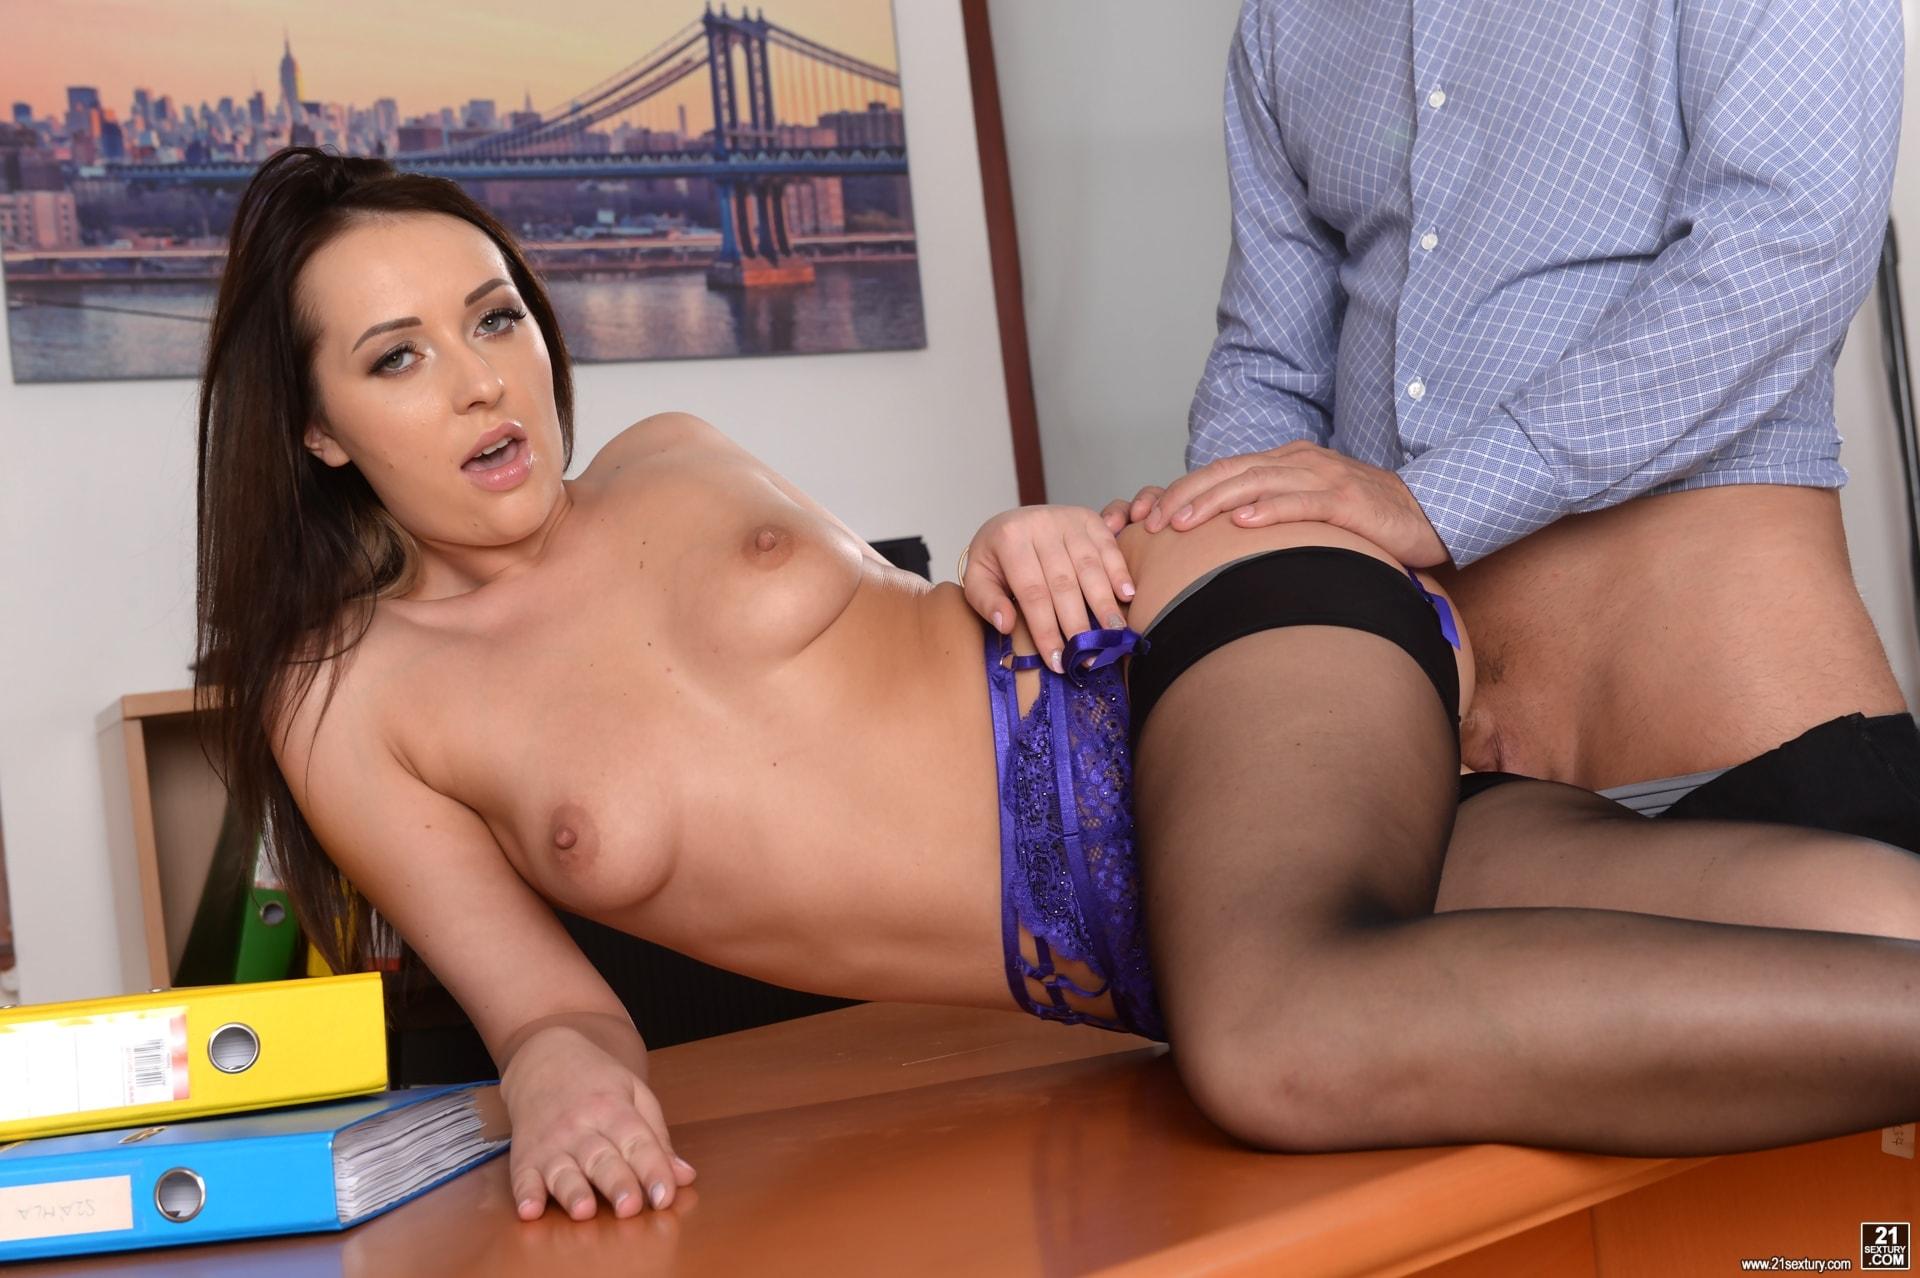 21Sextury 'Anal Secretary' starring Carolina June (Photo 110)